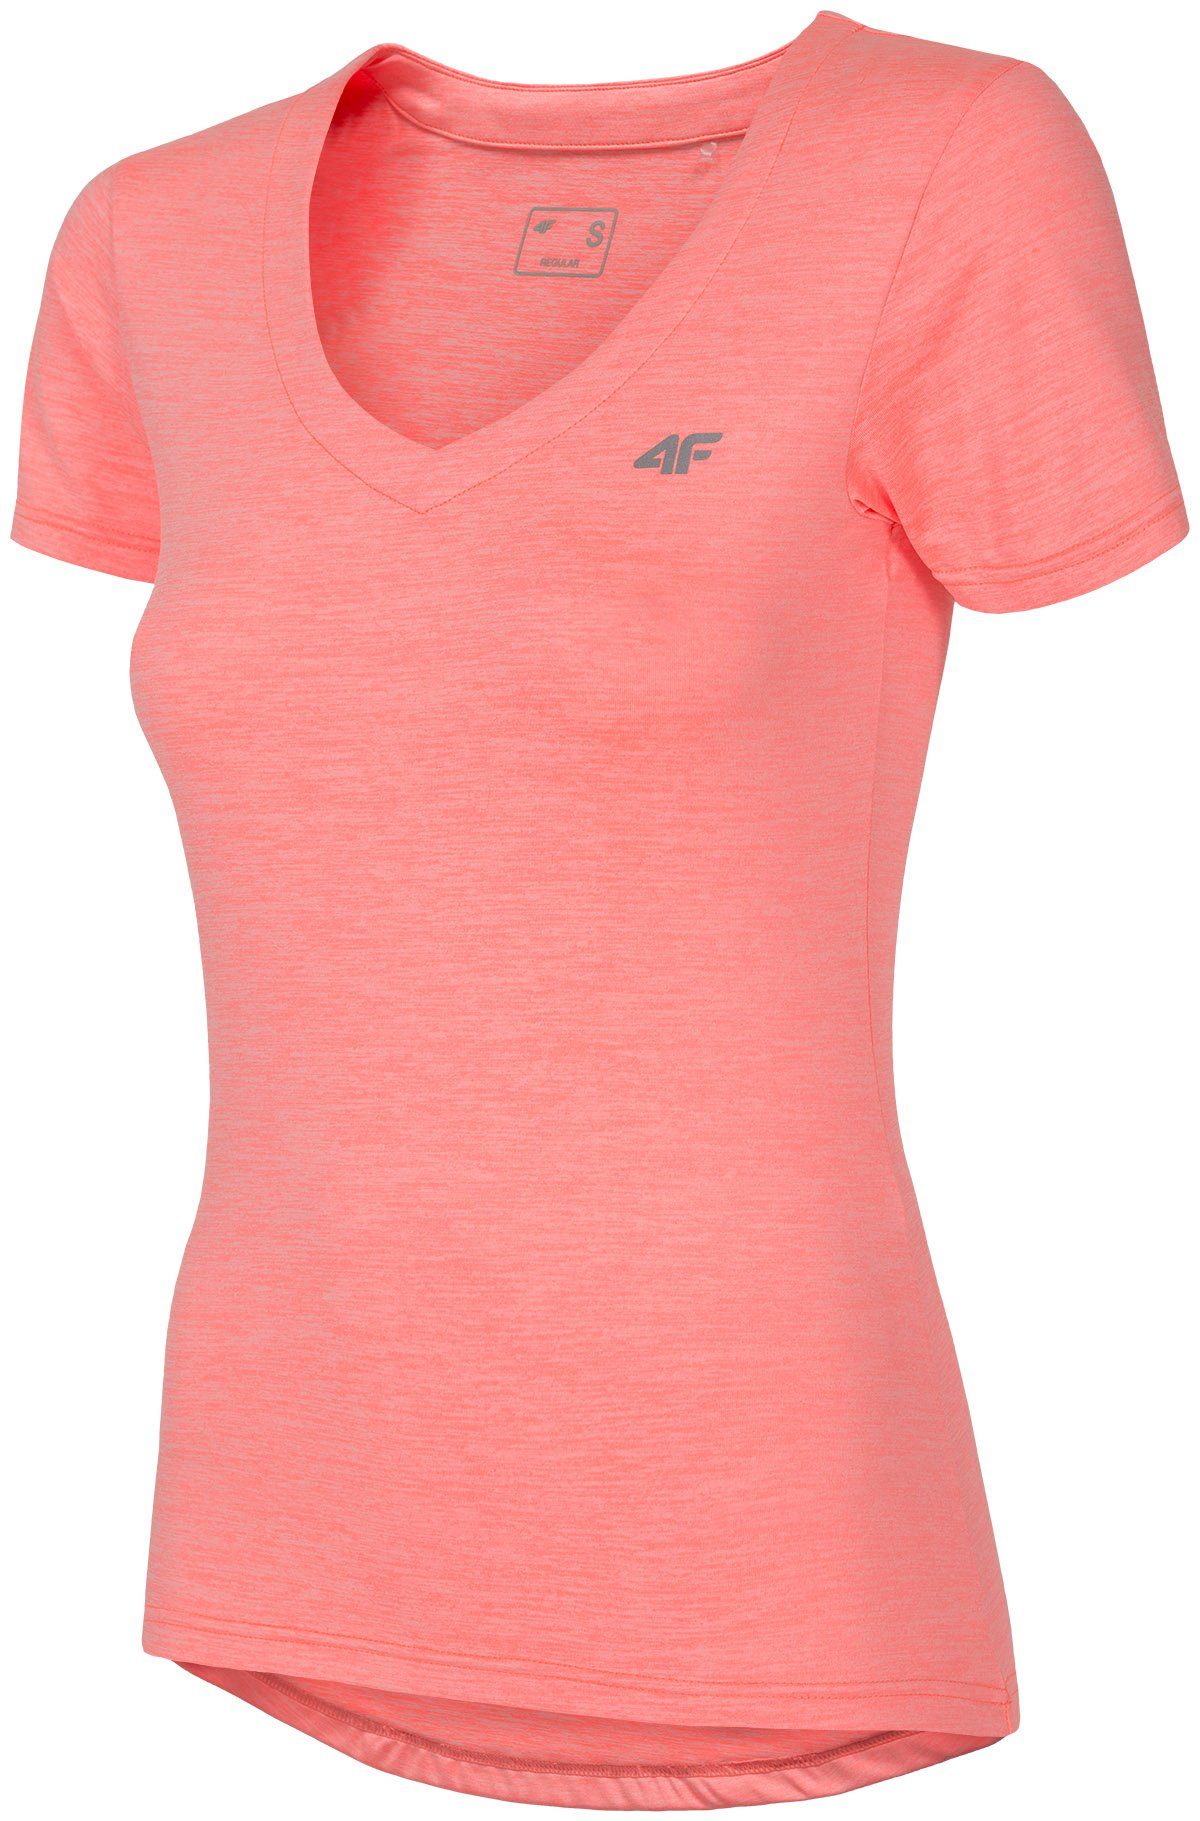 Koszulka treningowa damska TSDF300 - koral melanż